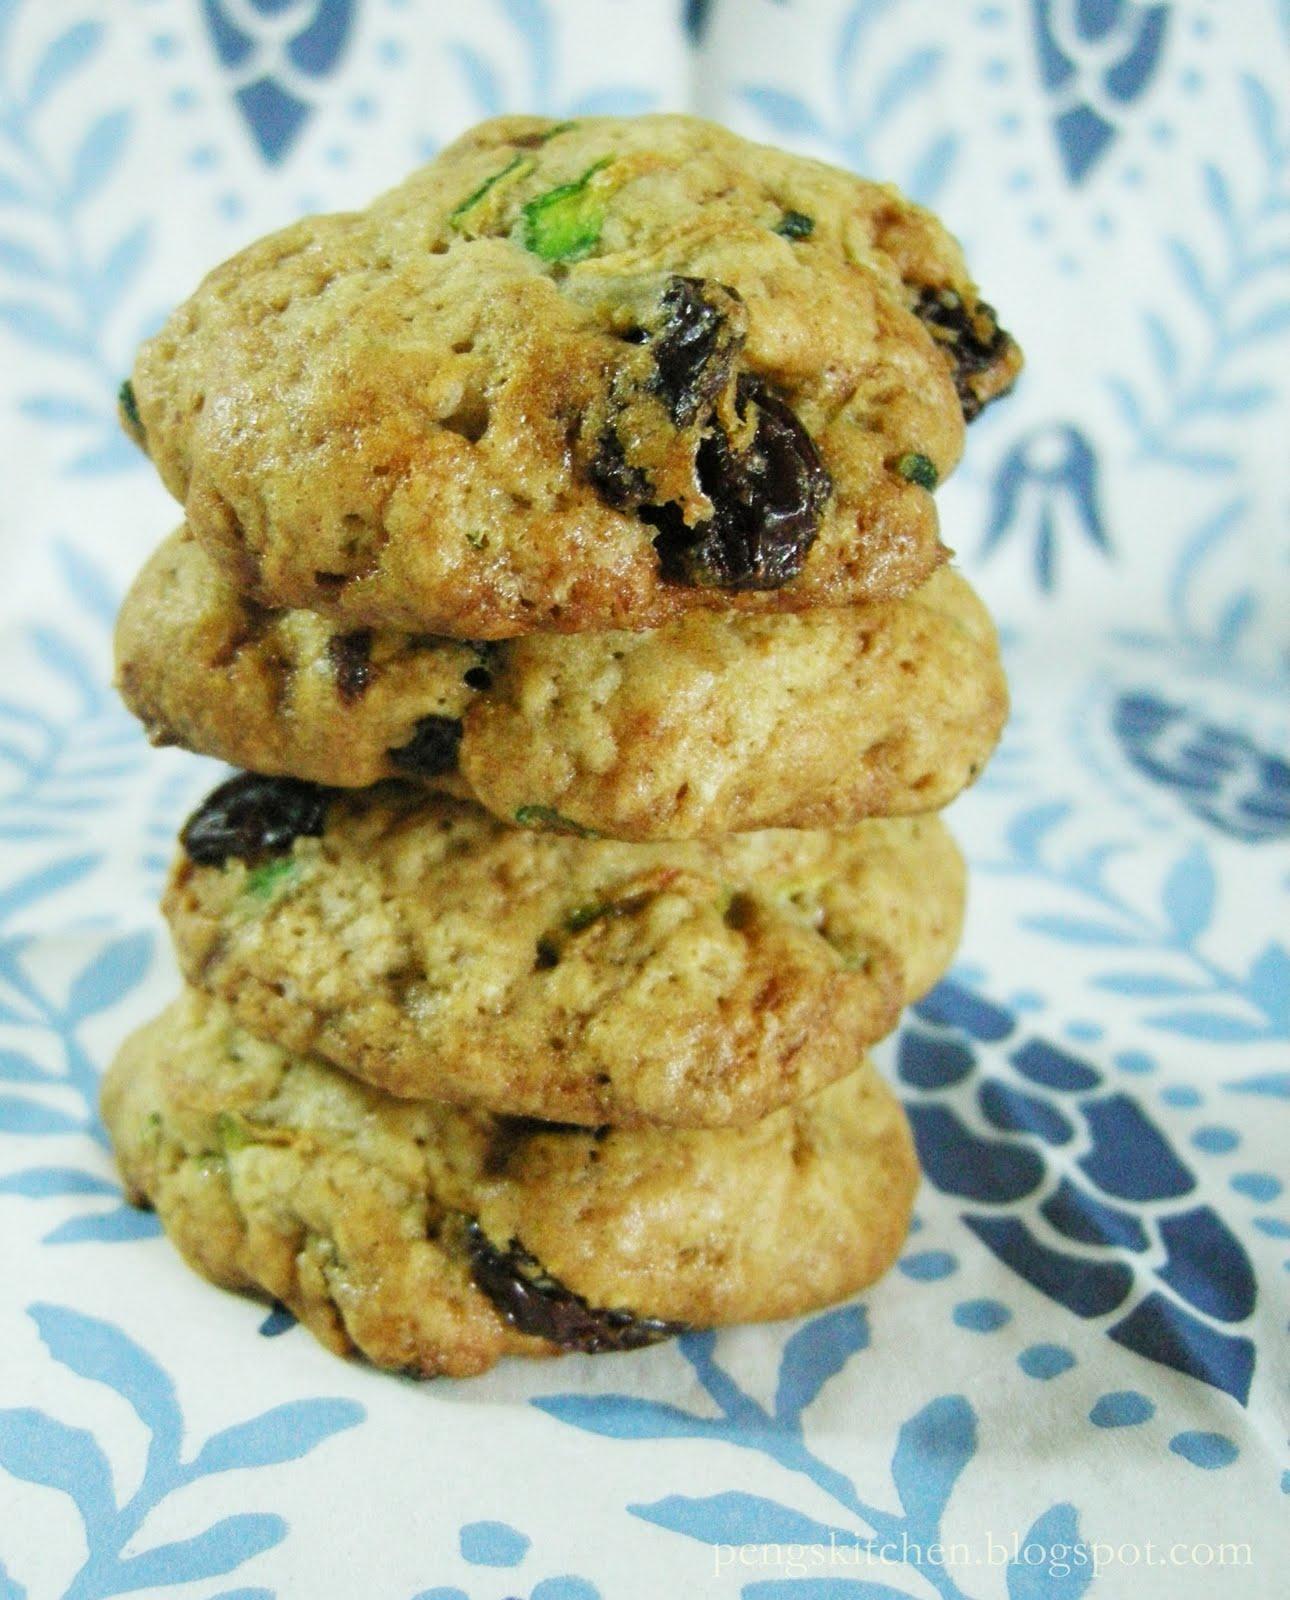 Peng's Kitchen: Zucchini Cookies